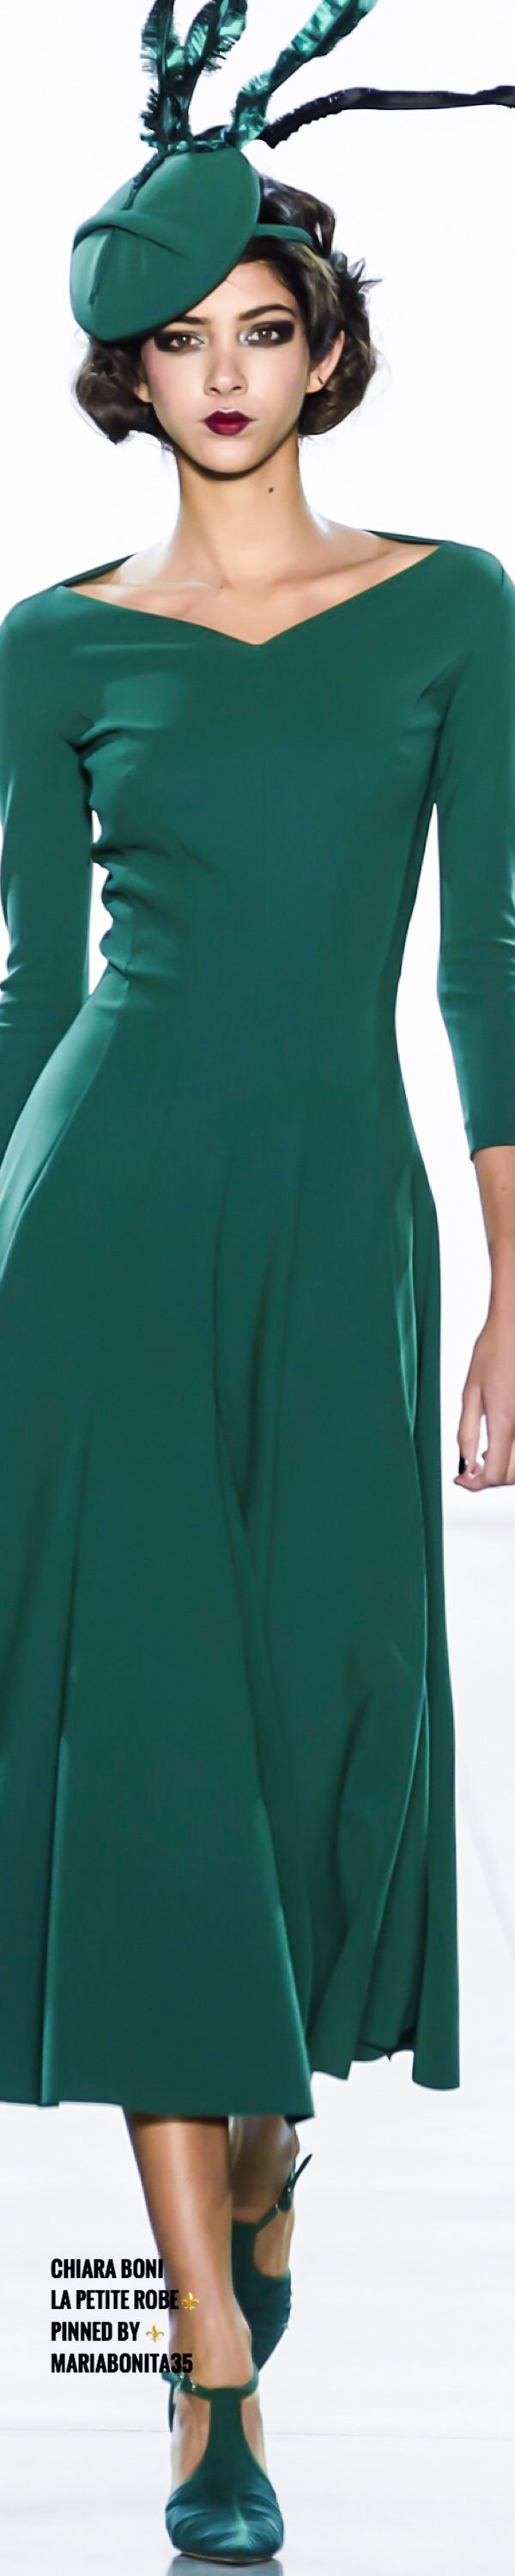 Petite robe retro chic